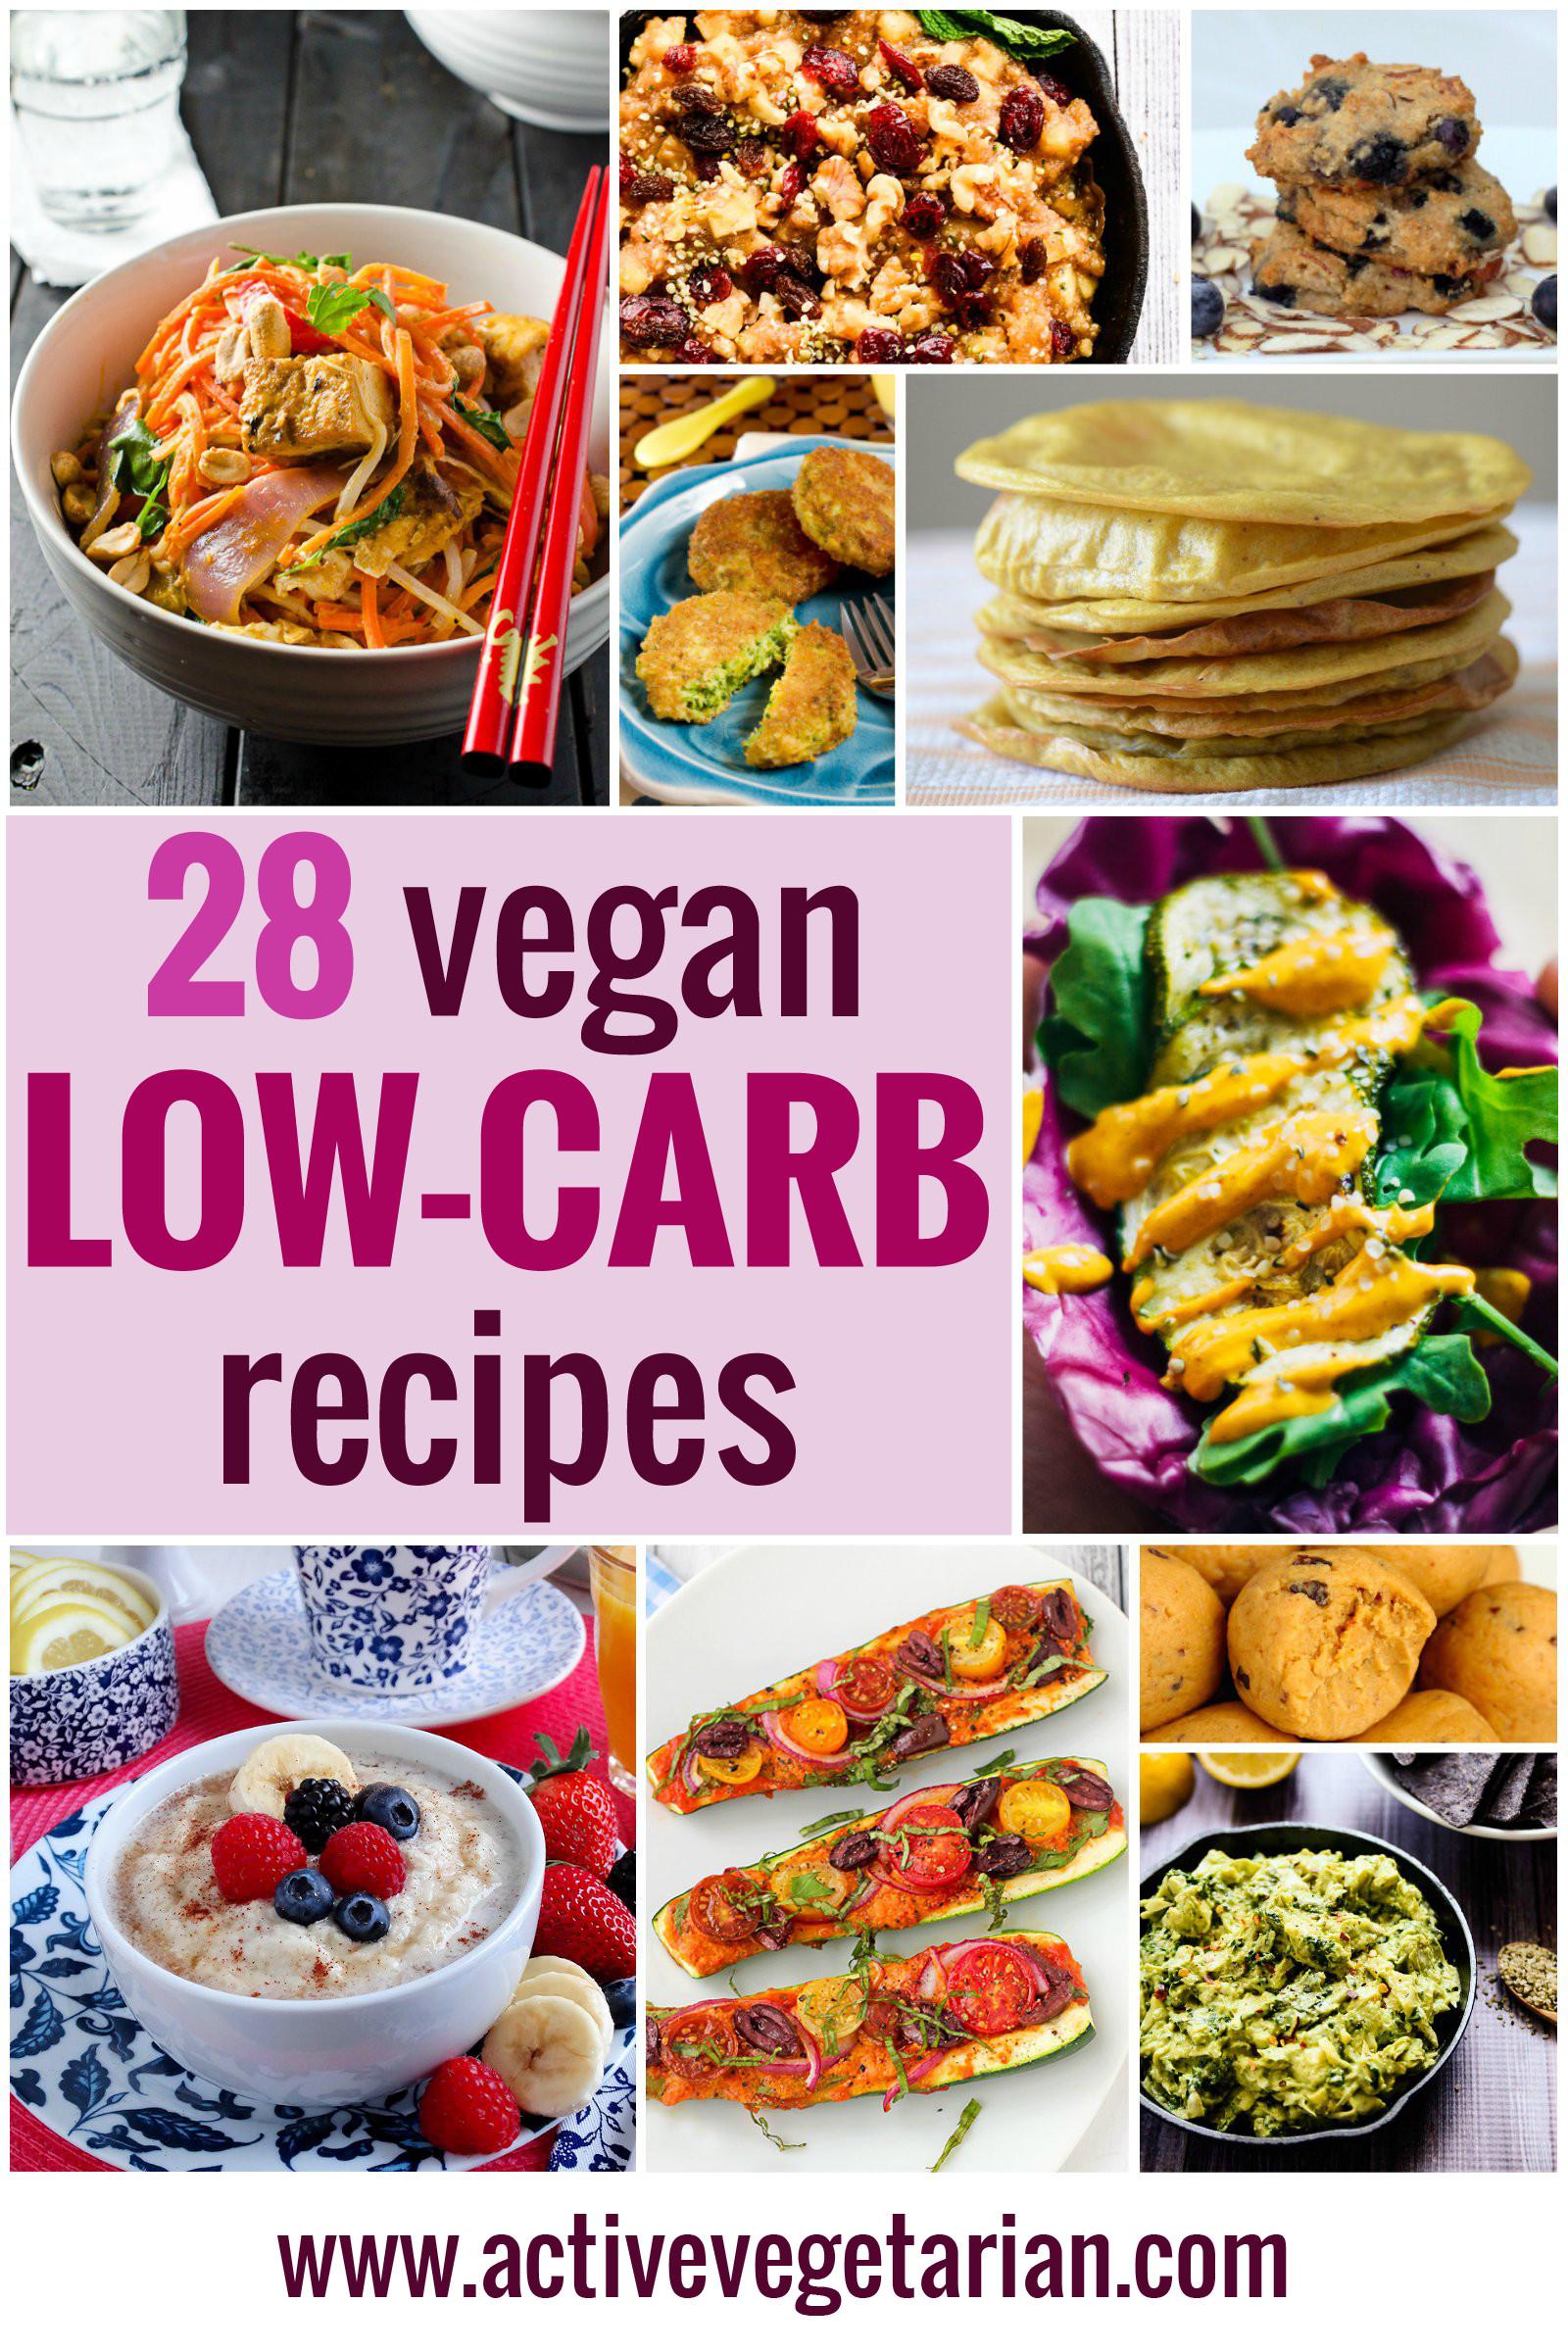 Low Carb Vegetarian Dinner  Recipe Round Up – 28 Low Carb Vegan Recipes